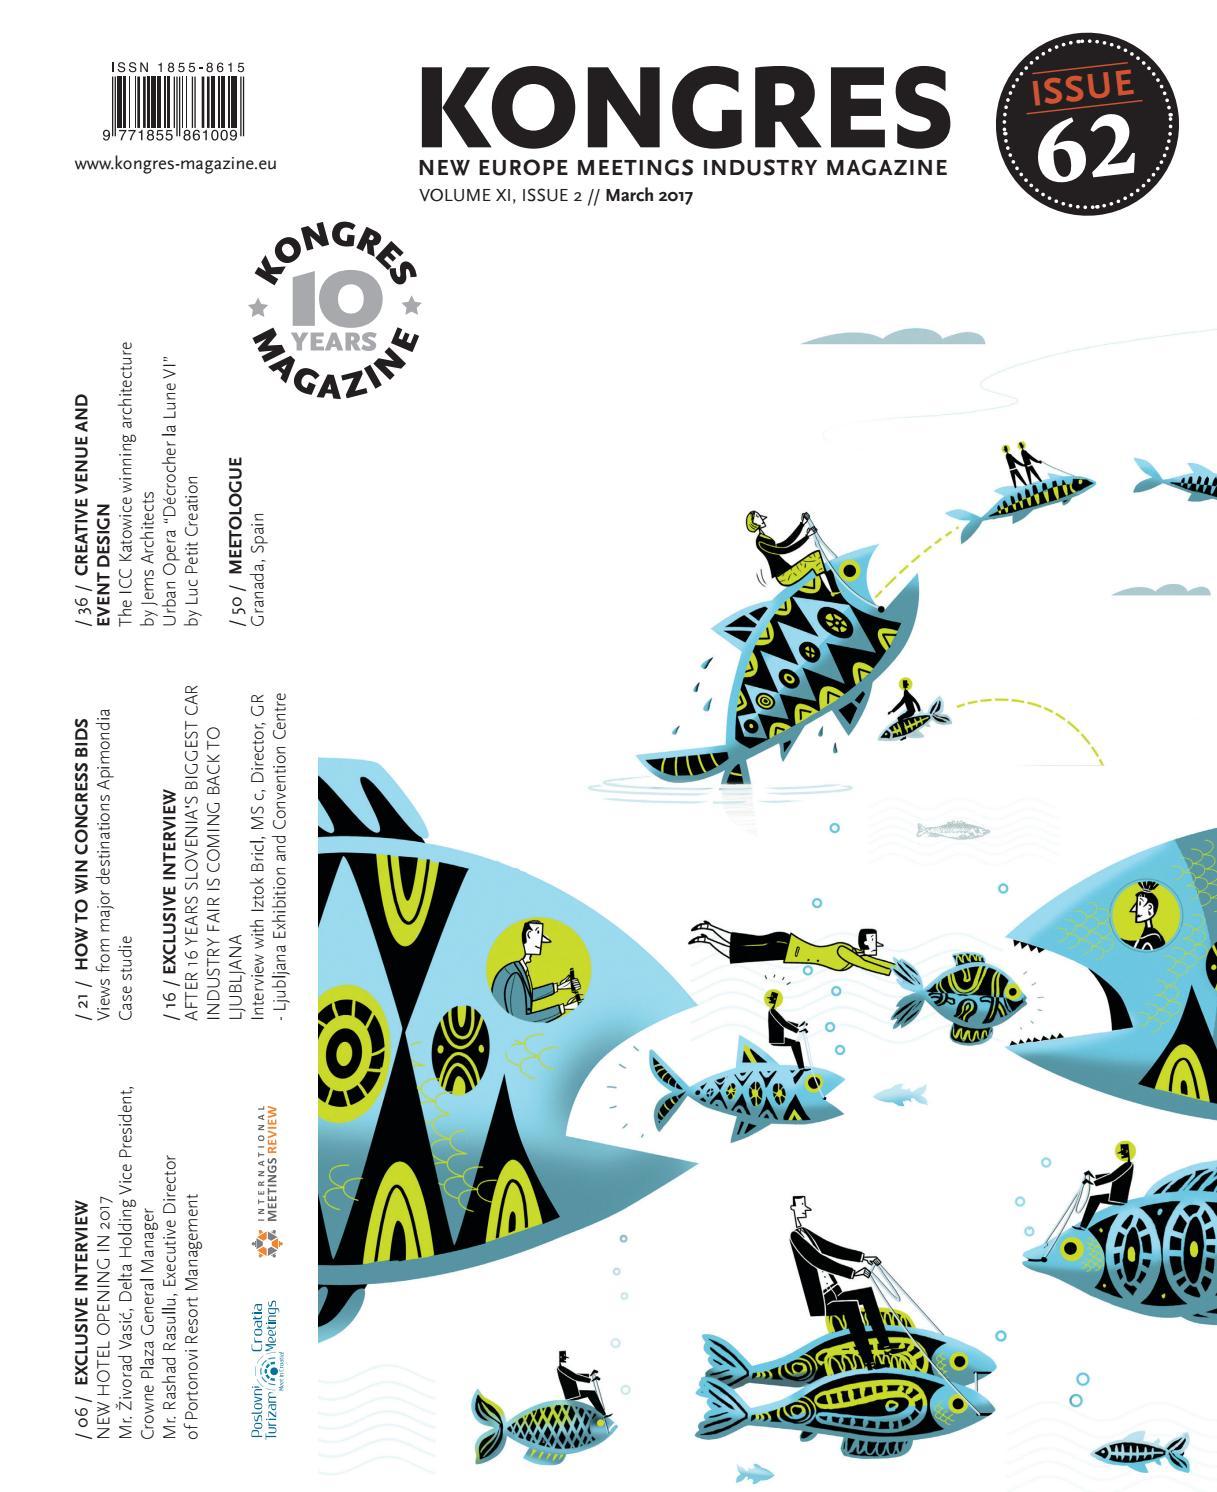 KONGRES MAGAZINE   SPRING ISSUE 2017 By KONGRES MAGAZINE   Issuu